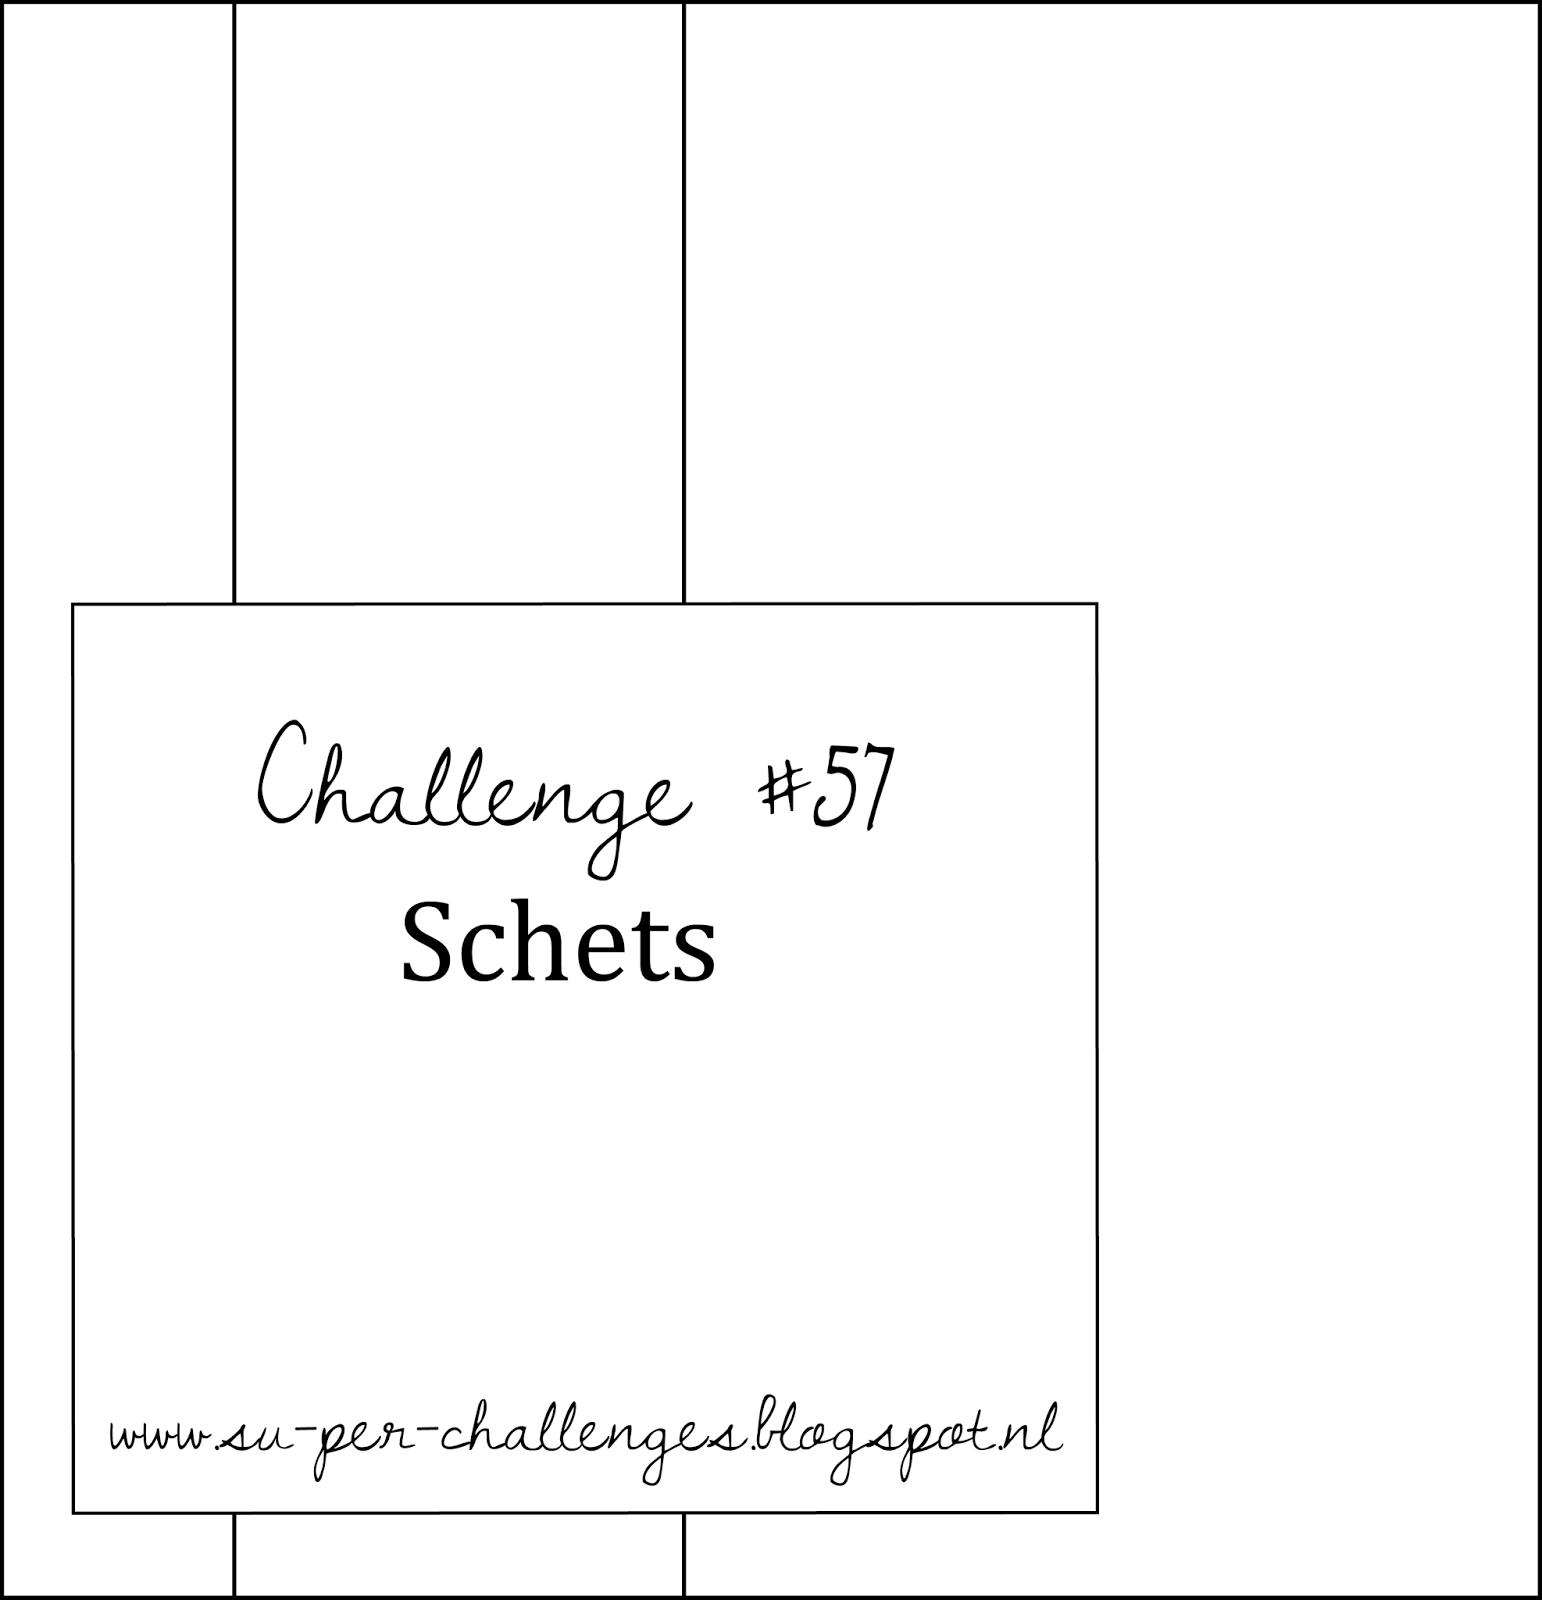 http://su-per-challenges.blogspot.nl/2014/10/challenge-57-sketch.html